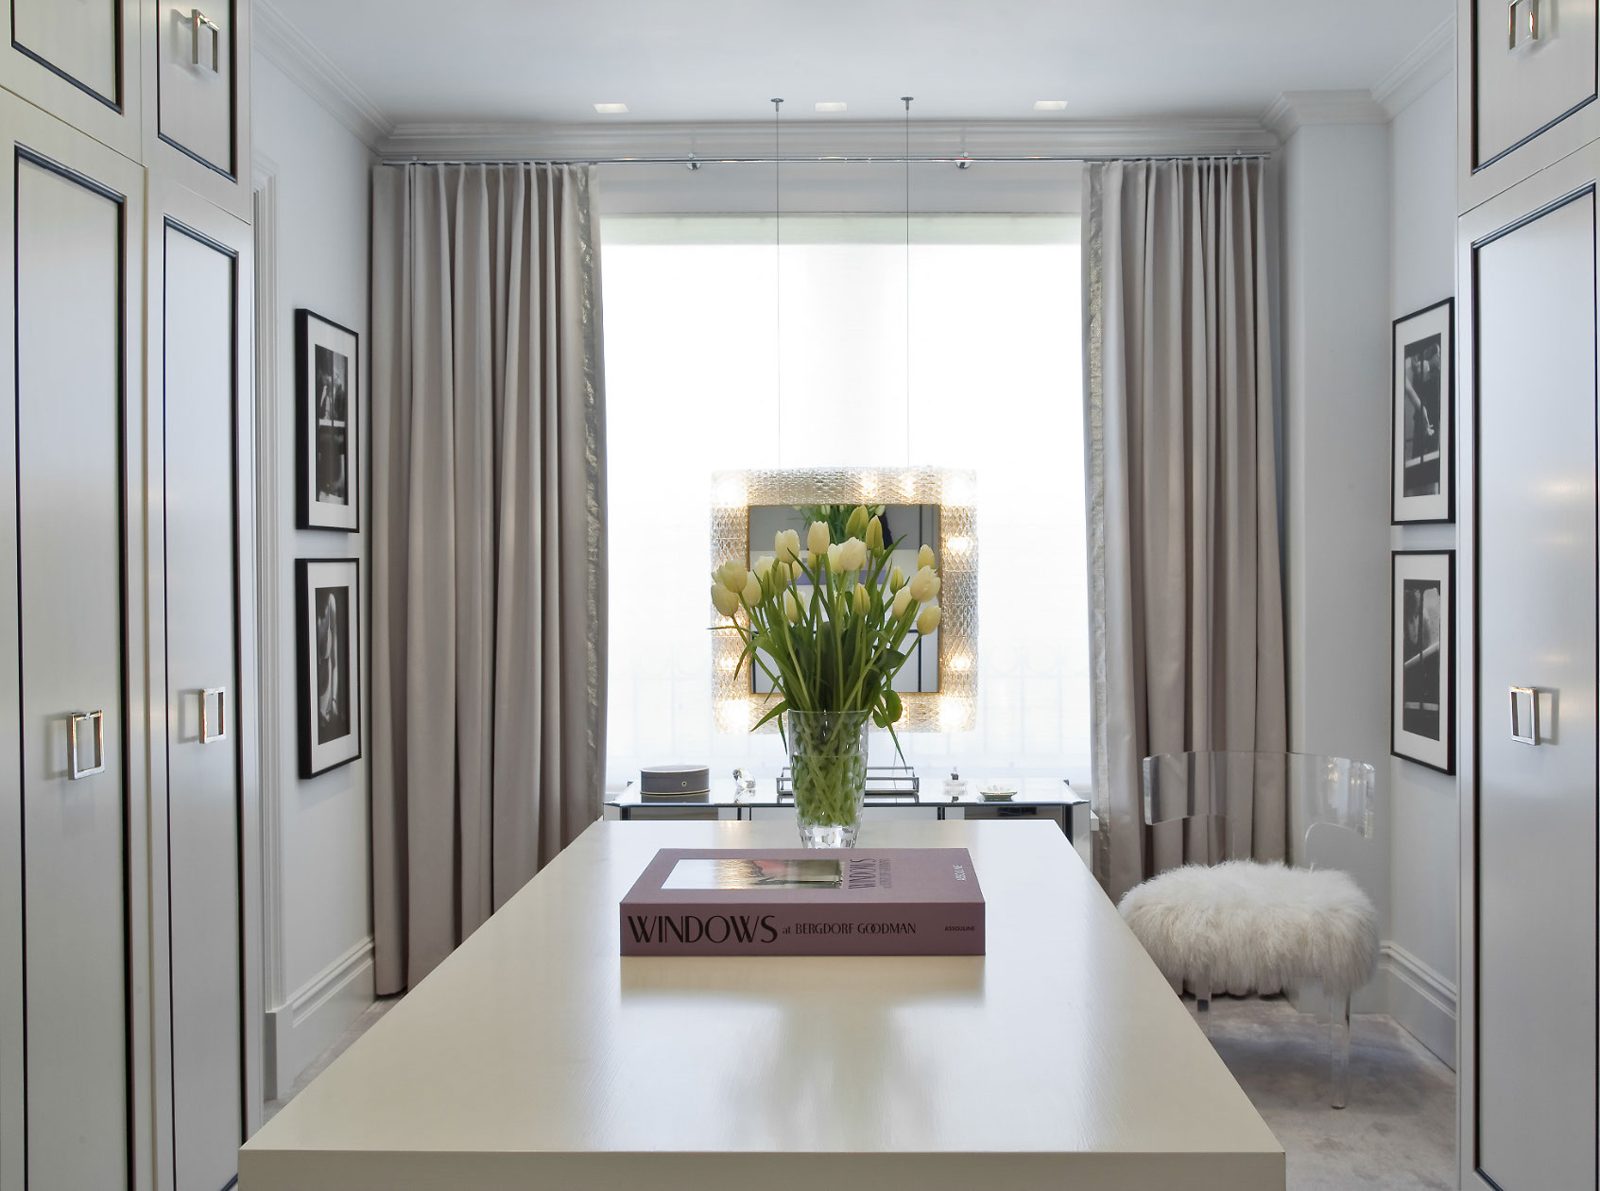 Eric Cohler Design Firm an Interior Design firm servicing New York